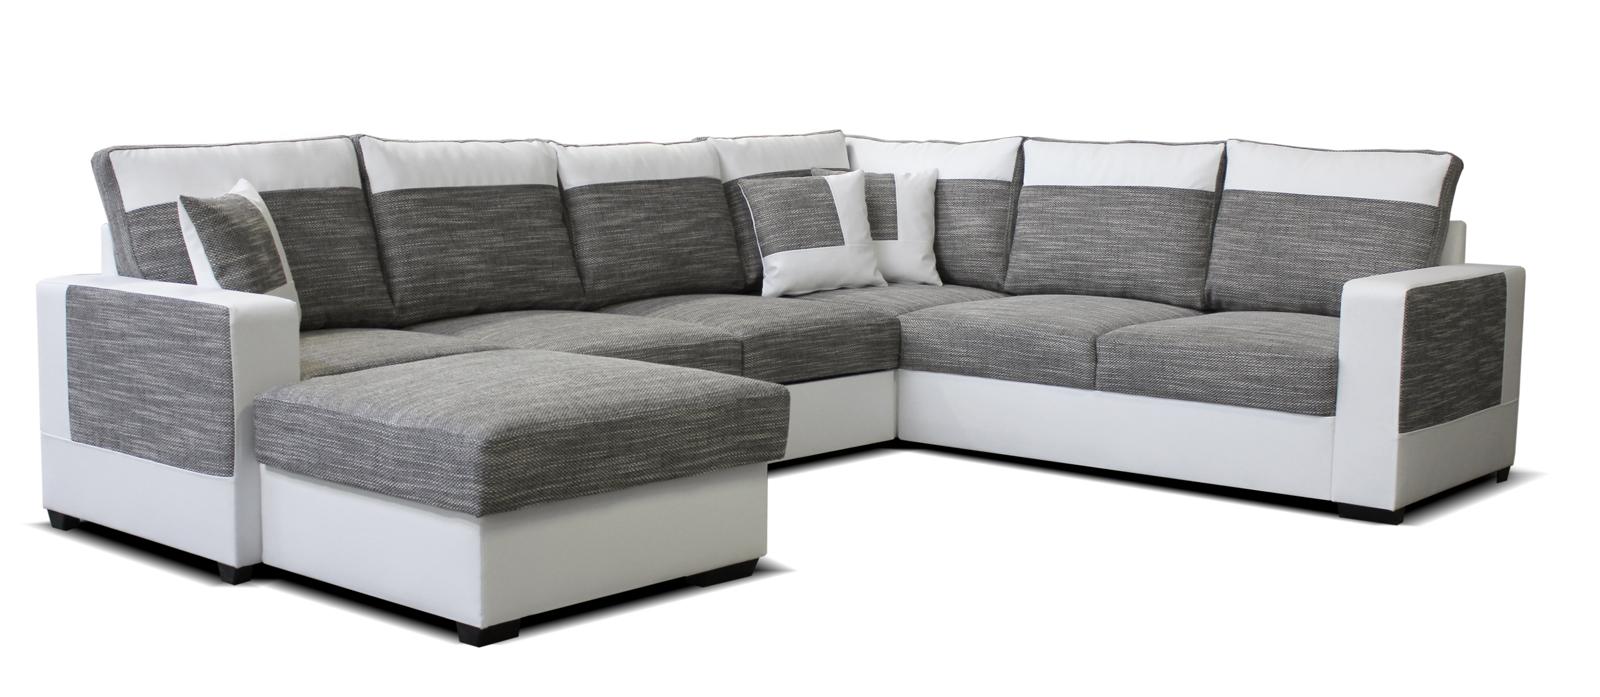 Rohová sedací souprava U - Po-Sed - Mega L+2F+A+2 (šedá + bílá) (L)